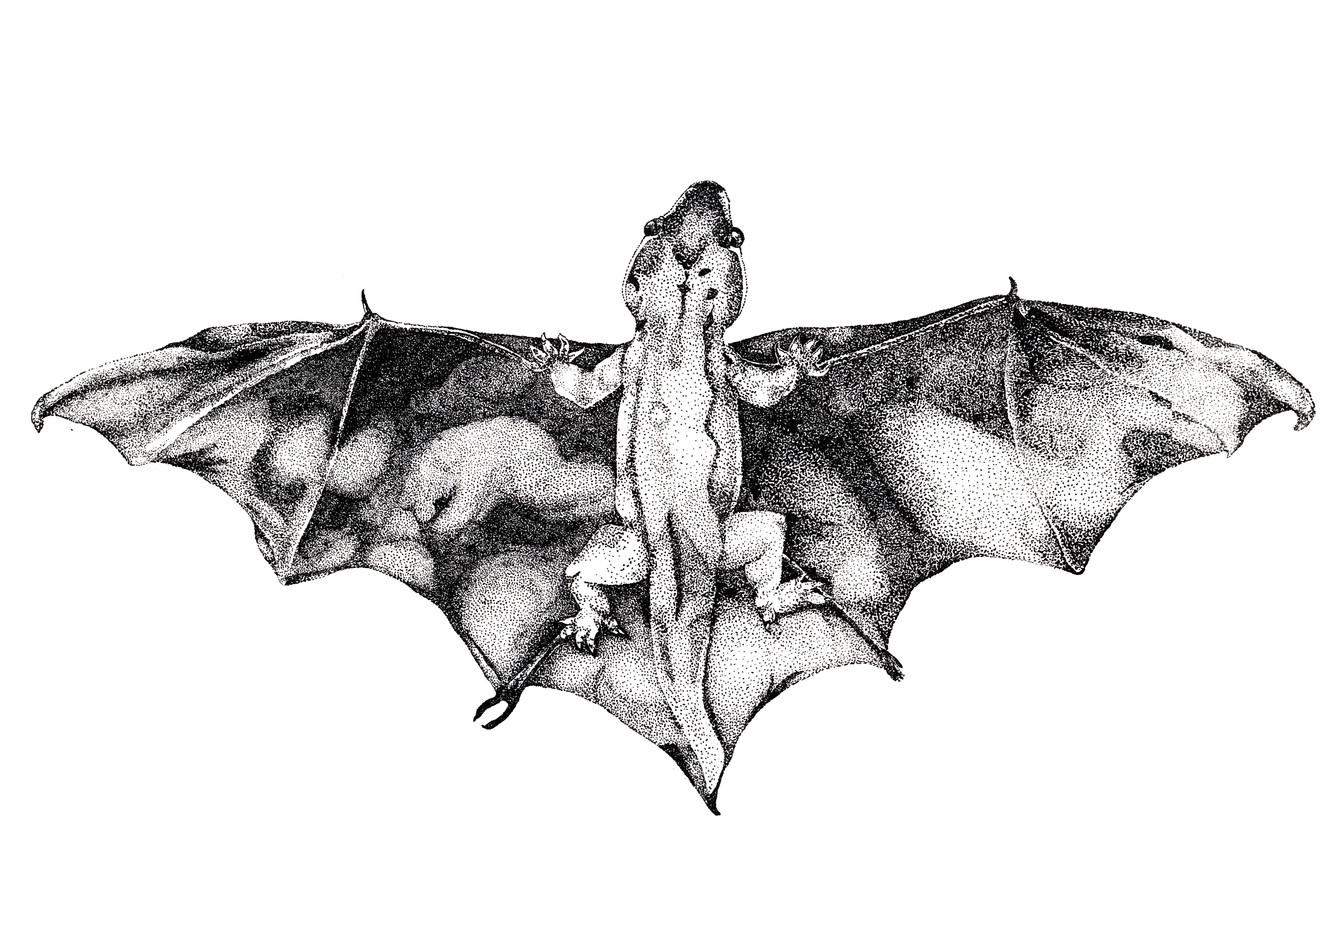 Plecotus pieressi, stone lithograph, 2014